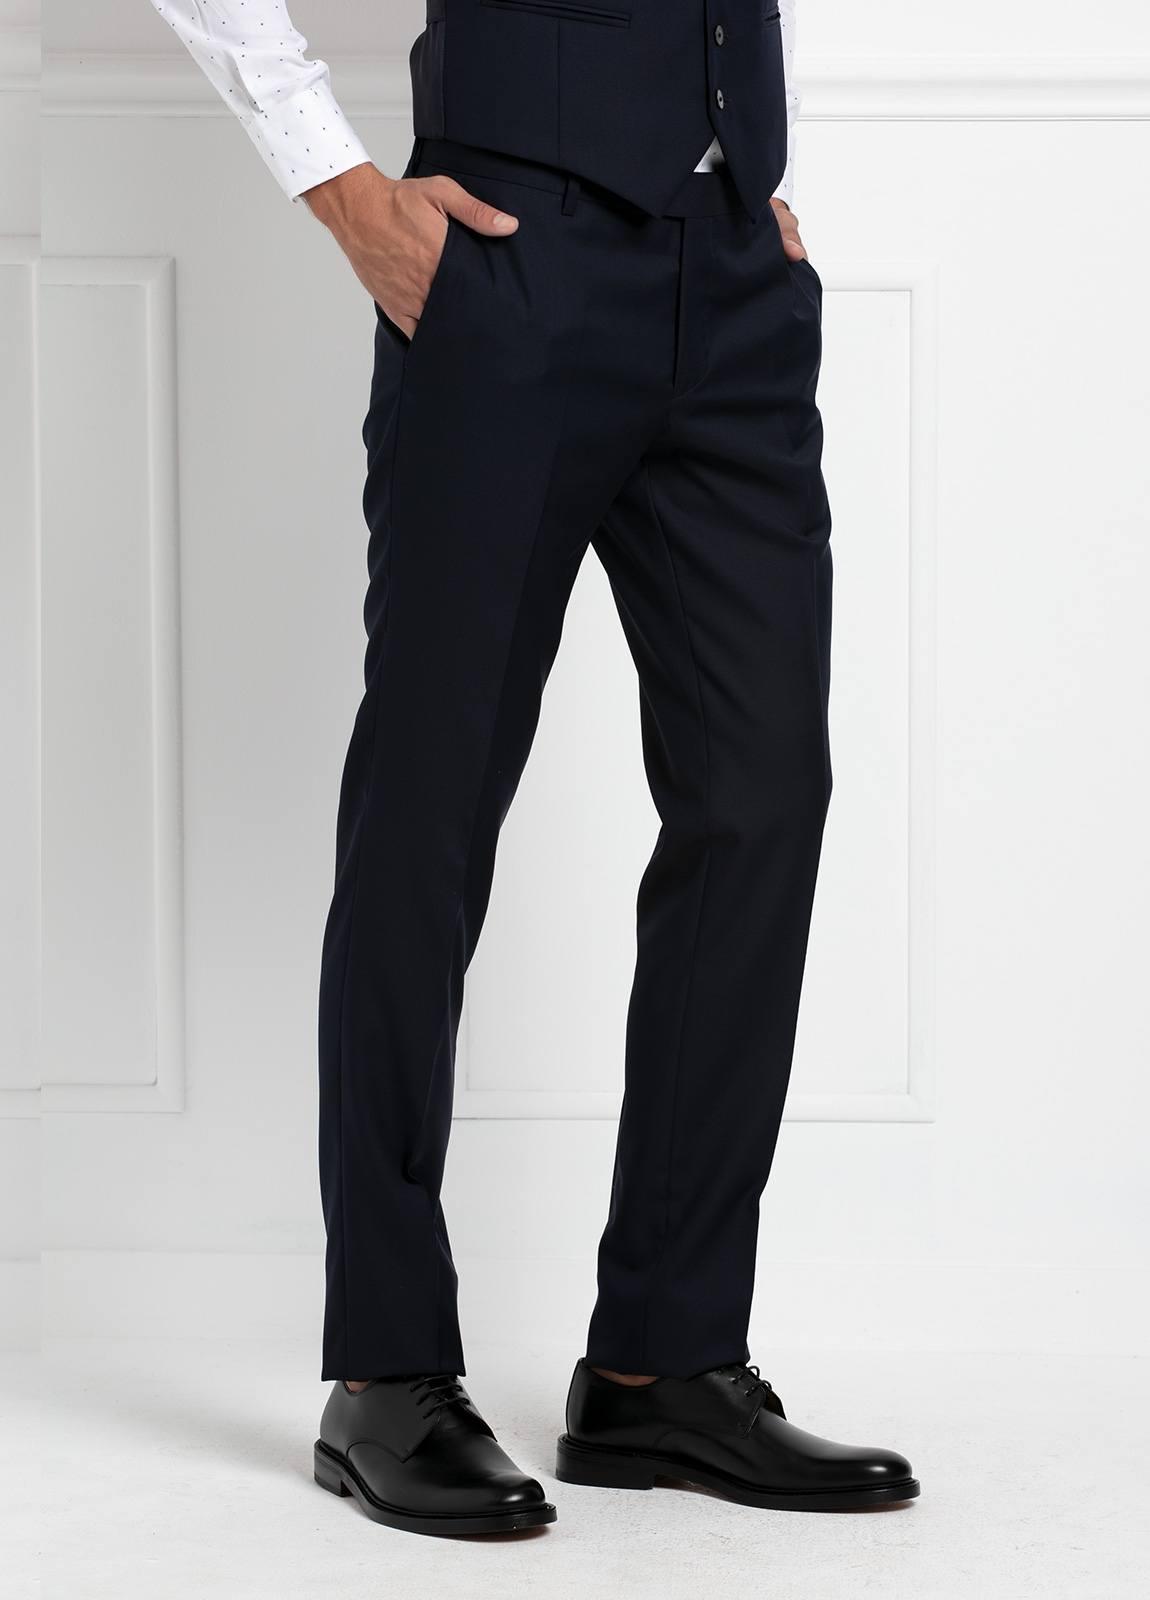 Traje liso SLIM FIT, tejido VBC con chaleco incluido, color azul marino, 100% Lana. - Ítem5